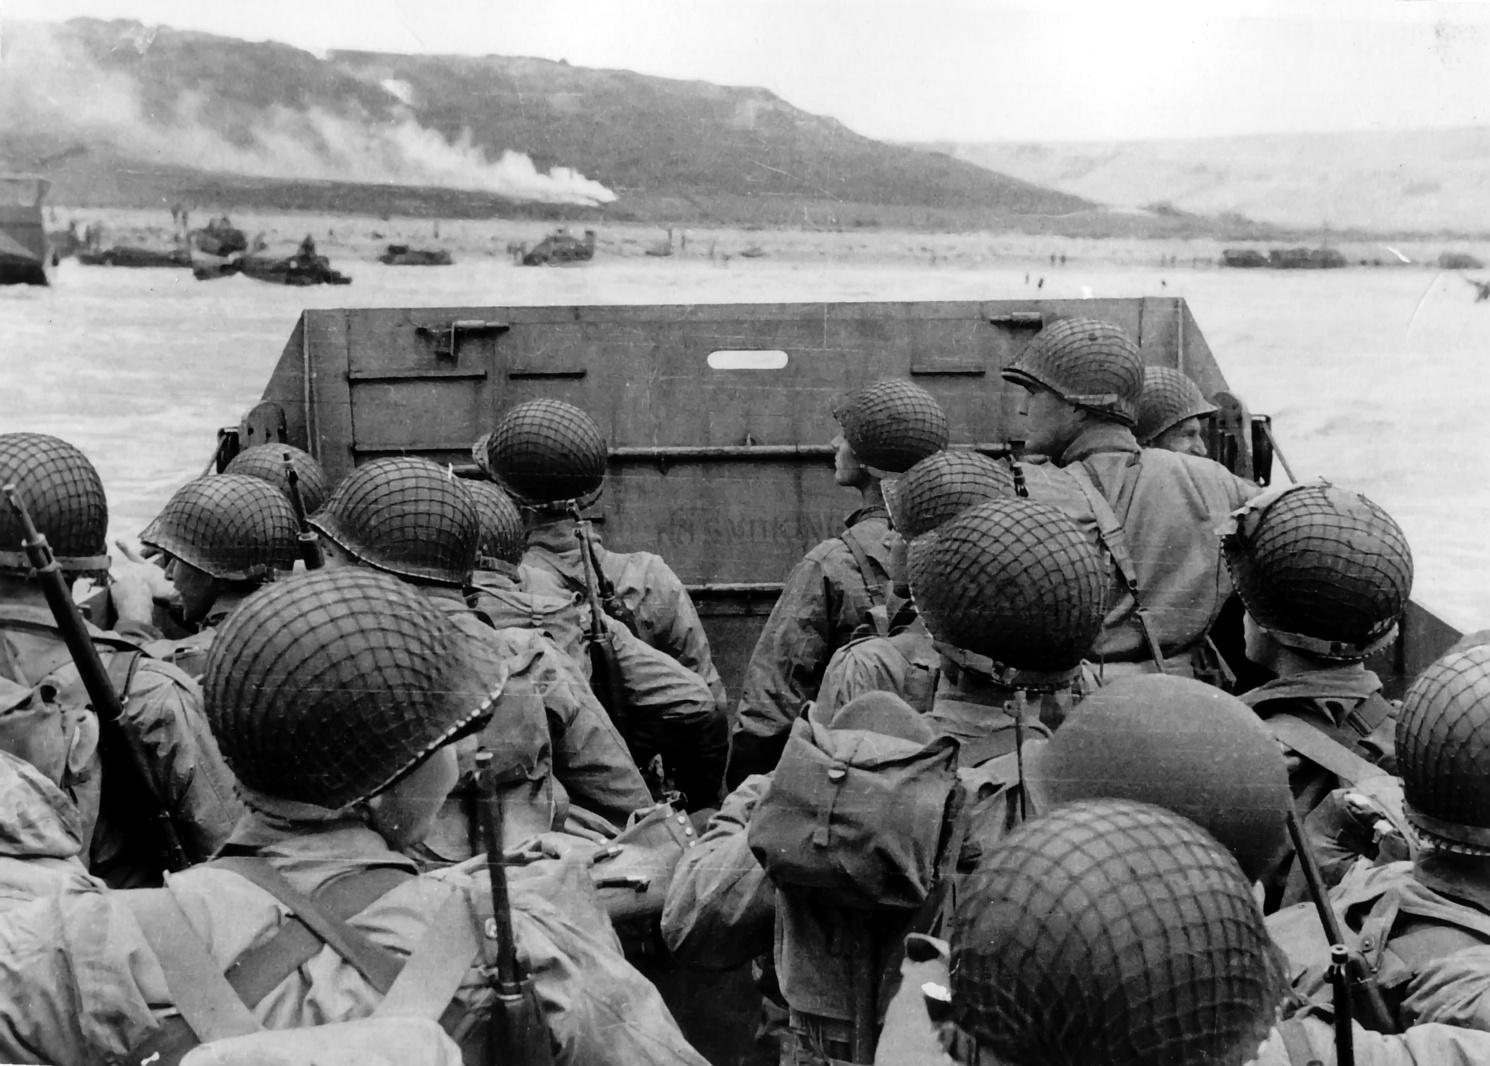 D Day The Legendary World War Ii Battle That Freed Europe